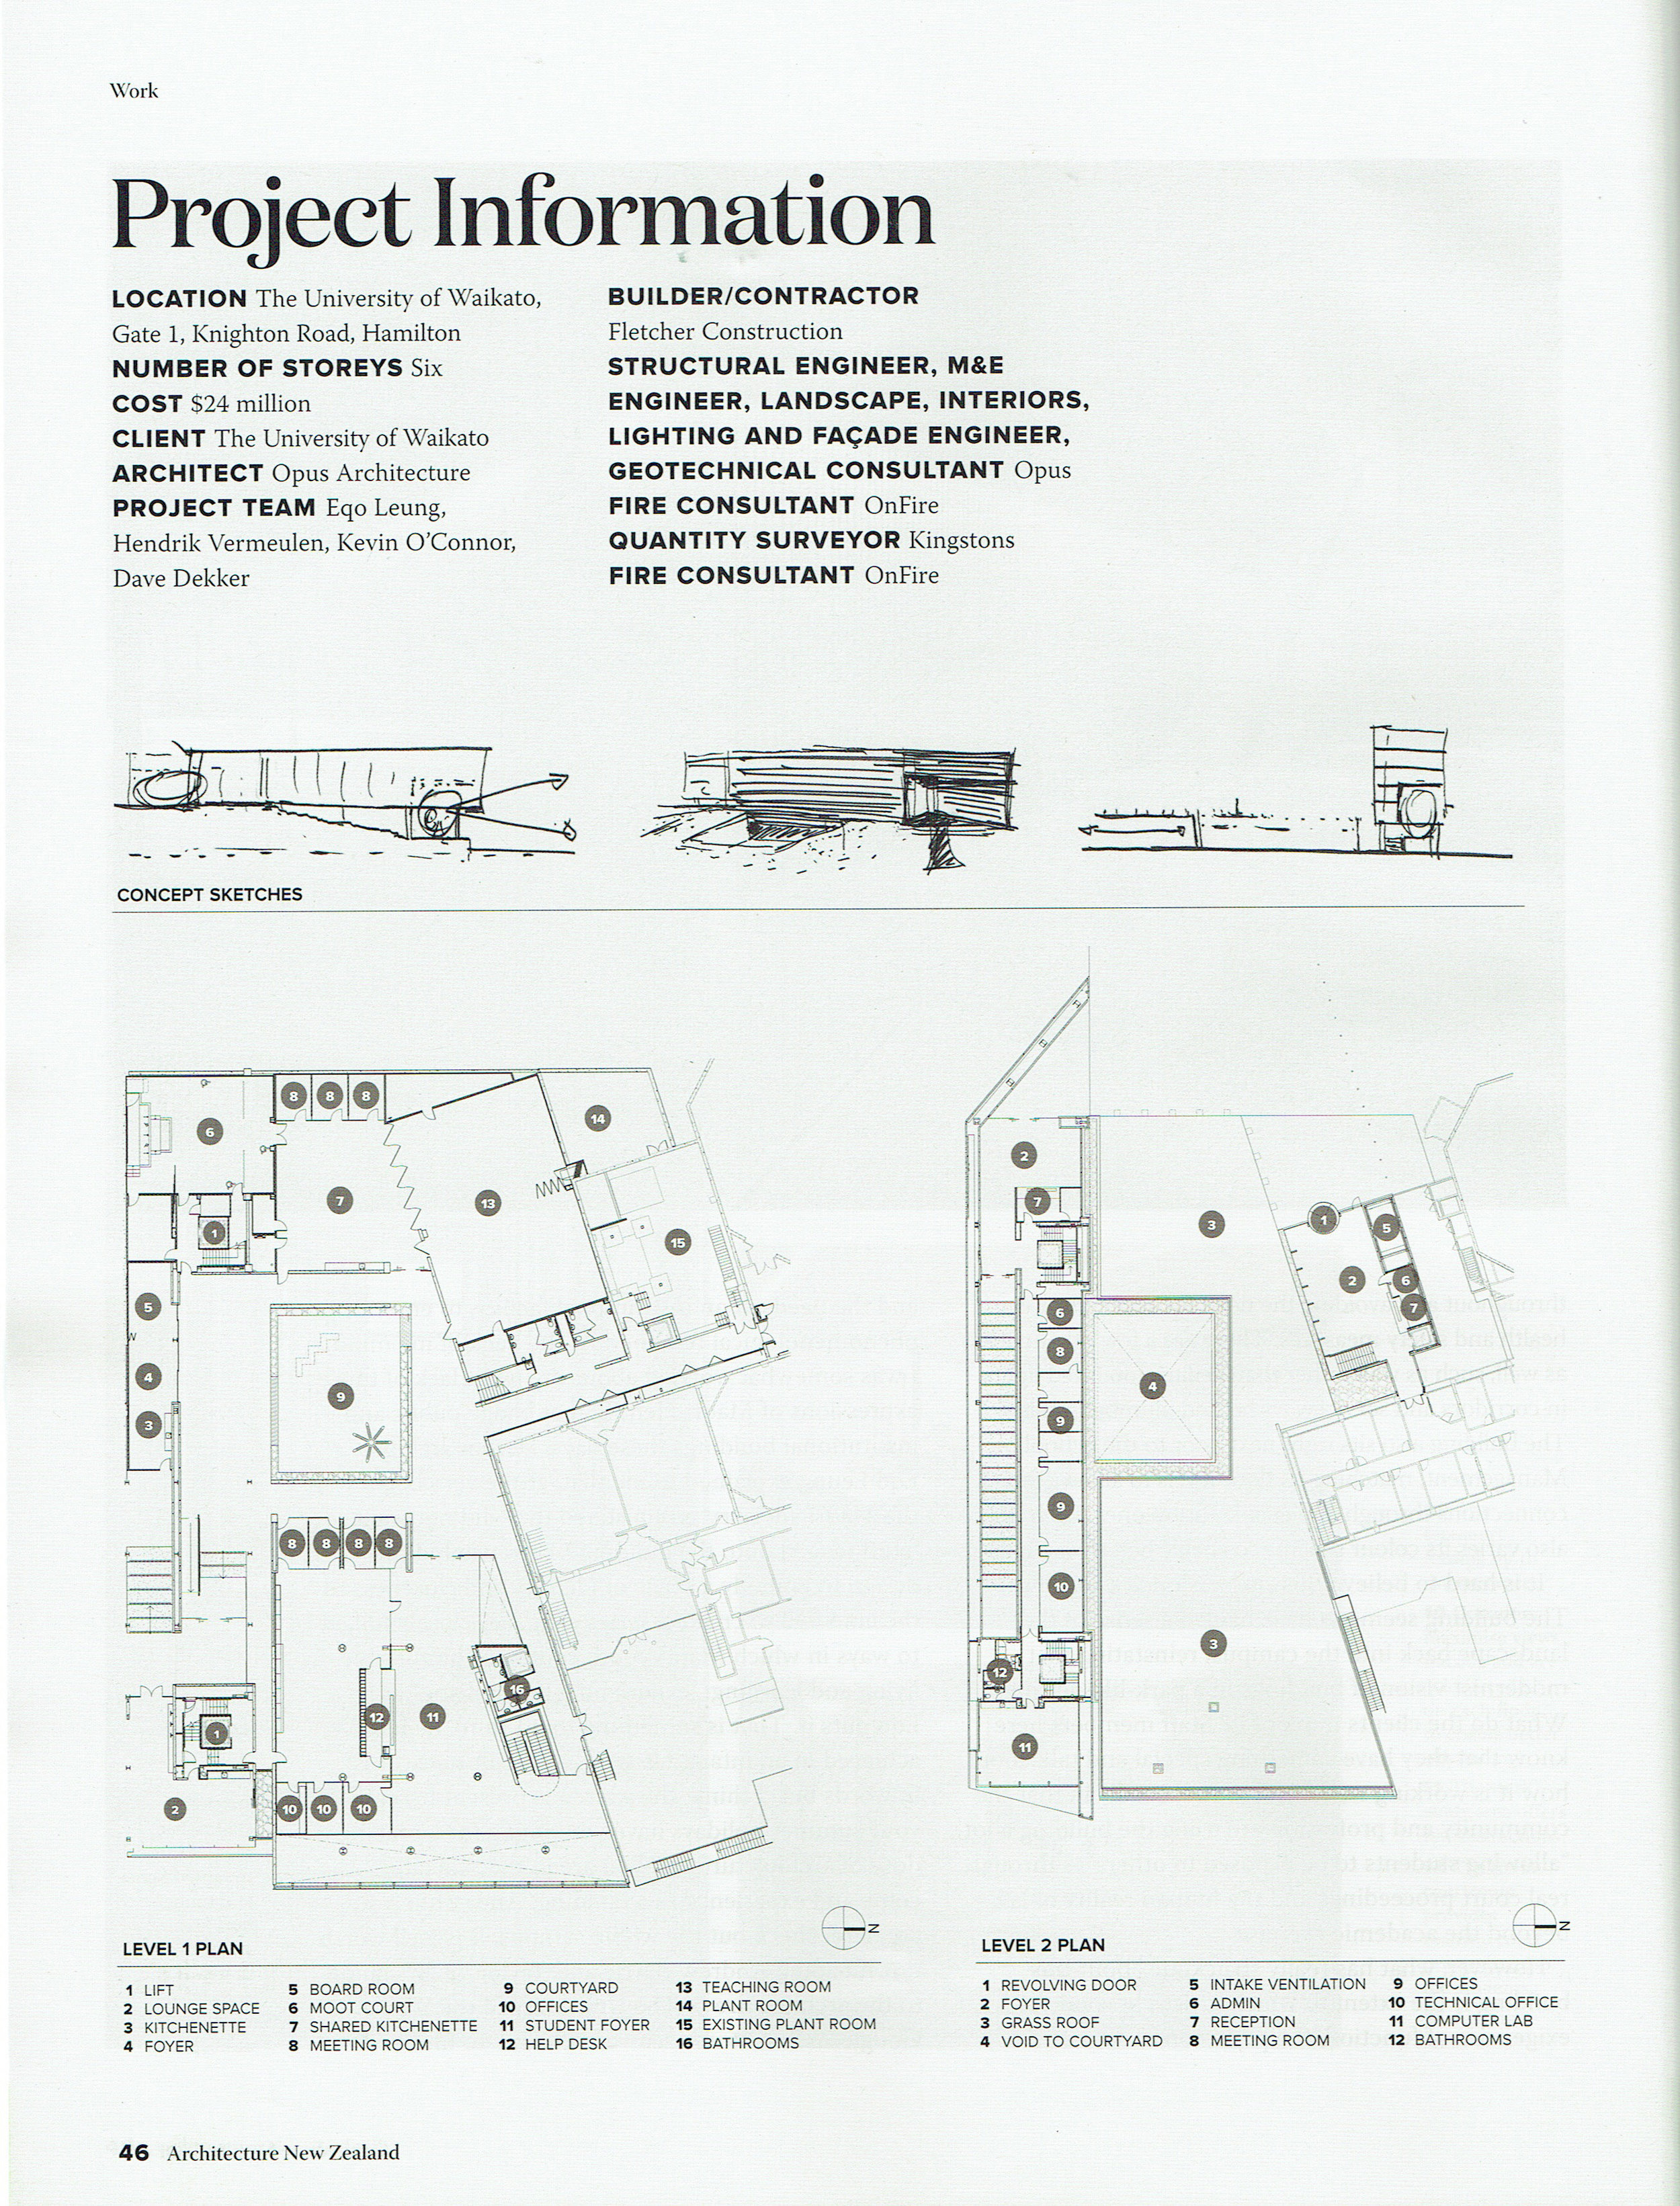 ArchNZ 3 6.jpeg